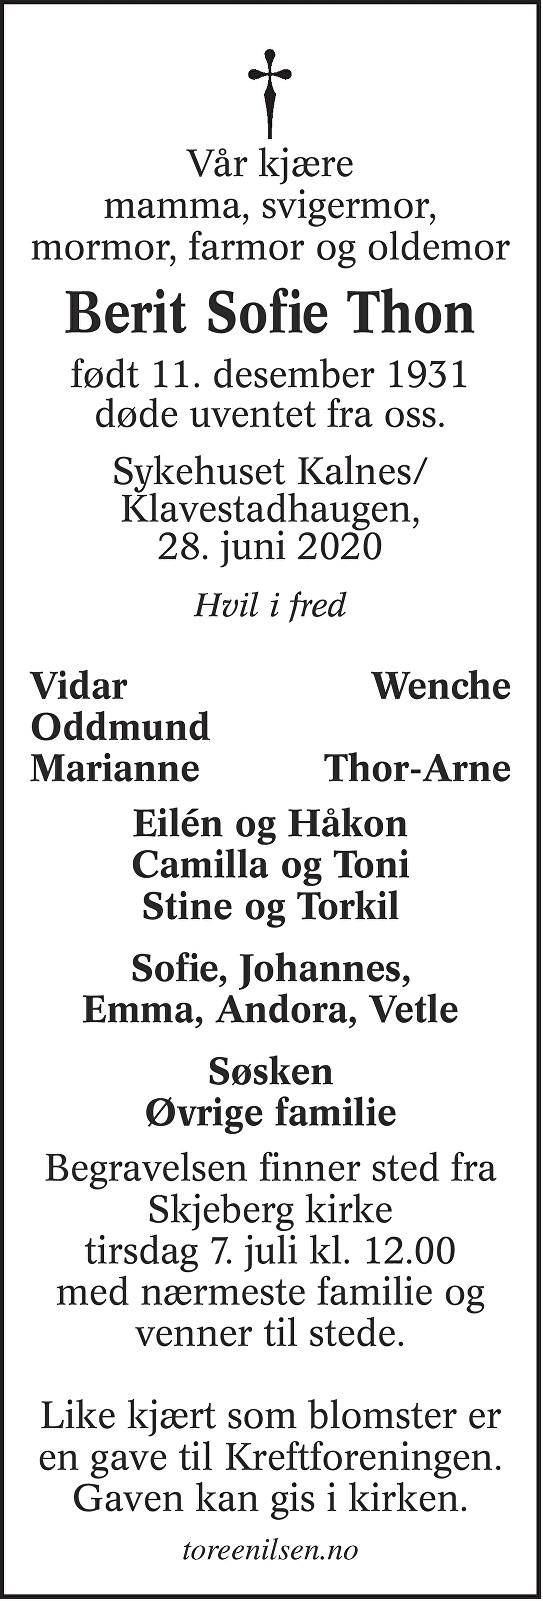 Berit Sofie Thon Dødsannonse